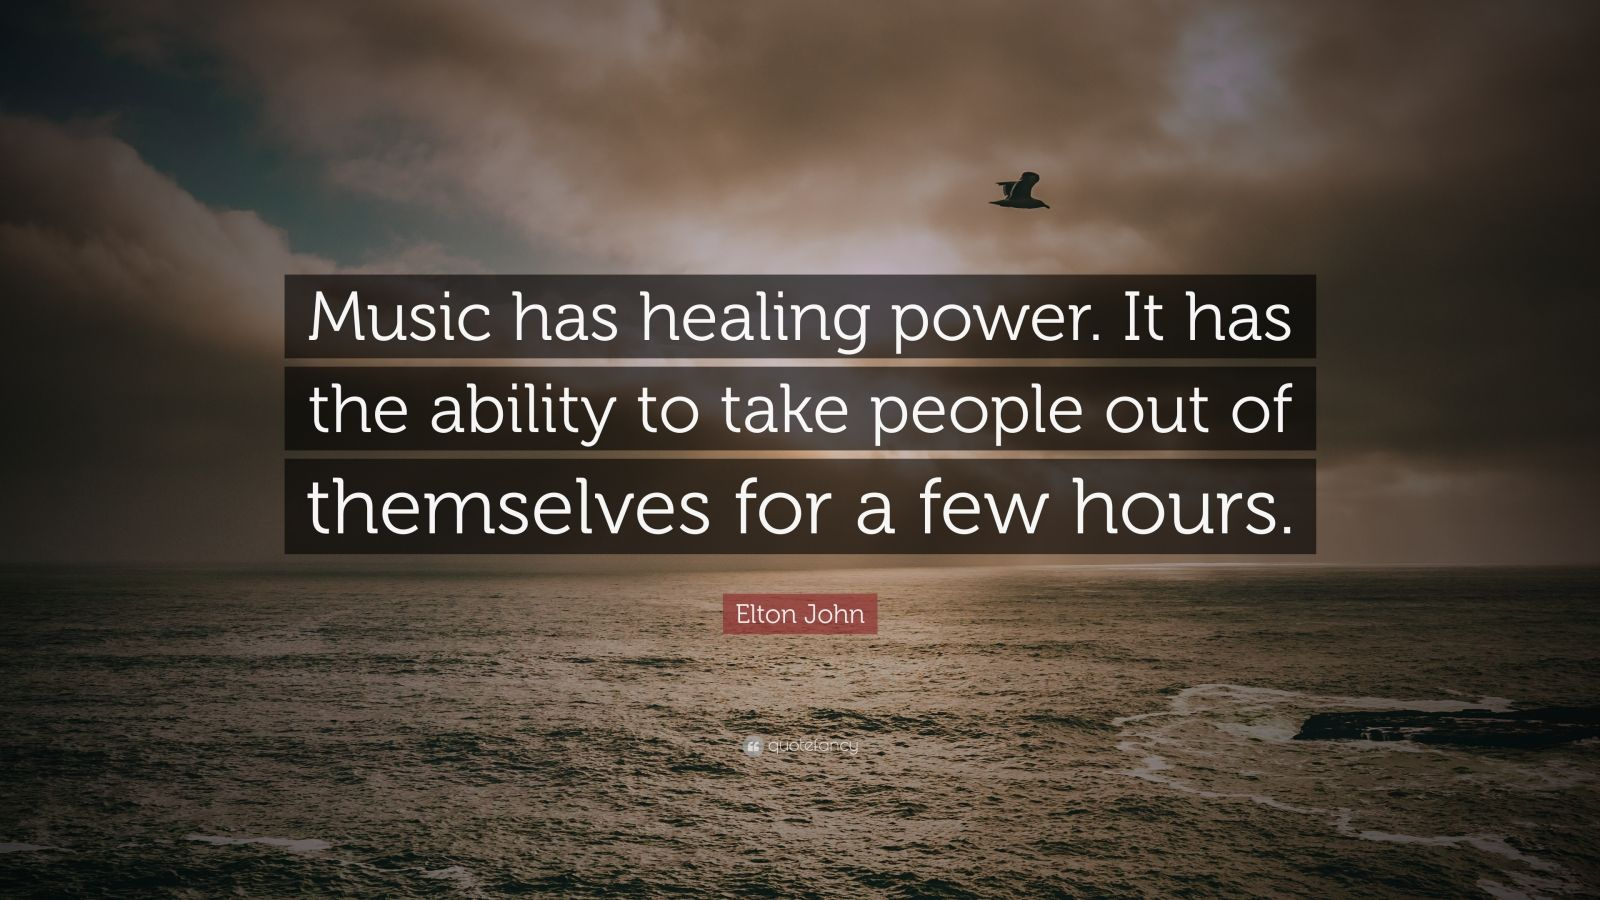 Kurt Cobain Quotes Wallpaper Elton John Quote Music Has Healing Power It Has The